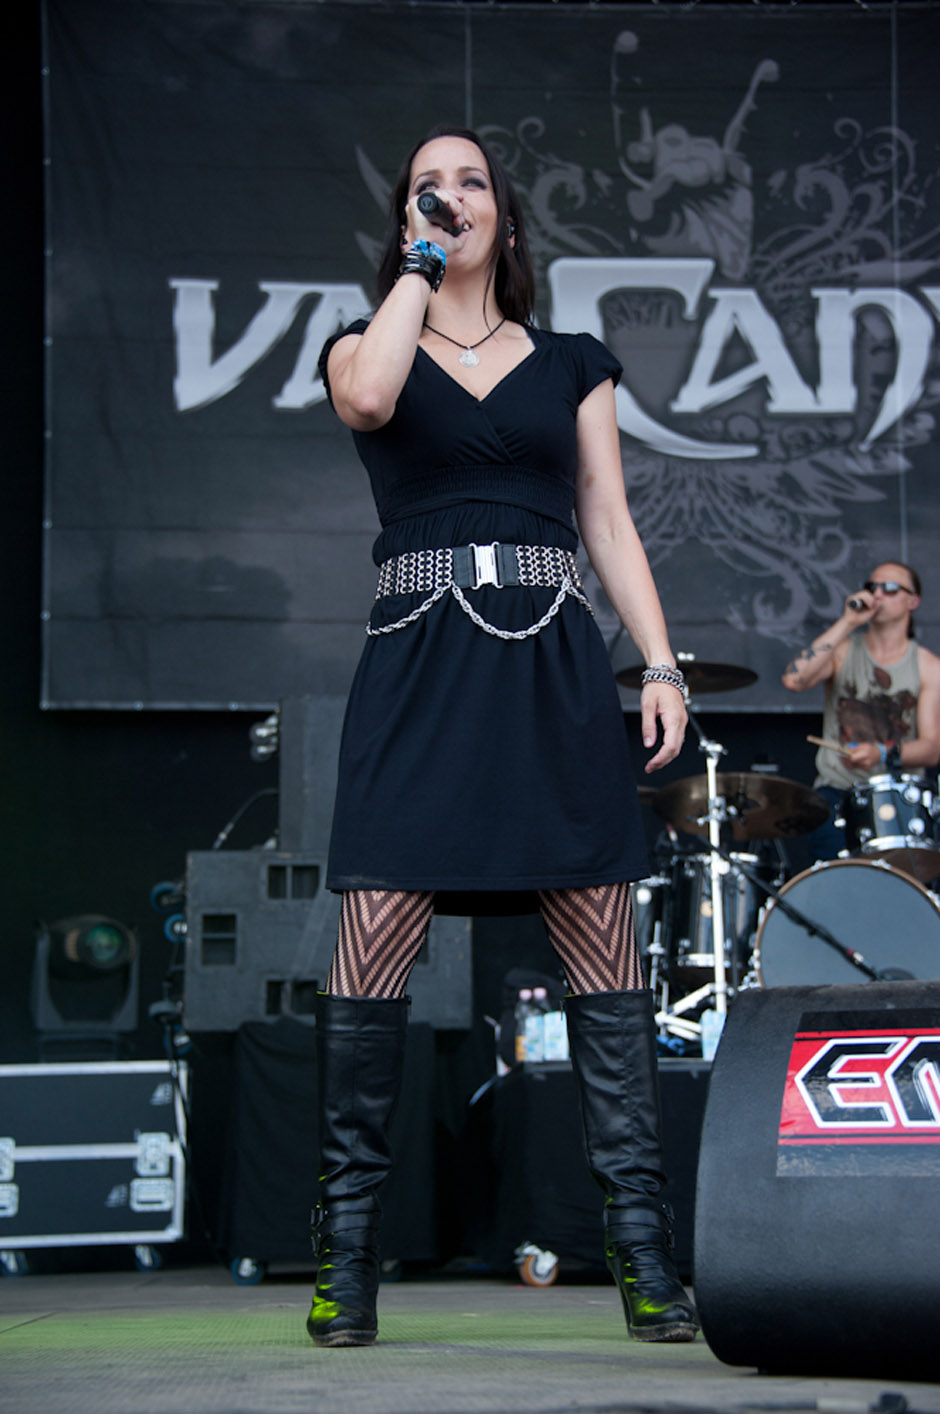 Van Canto live, Summer Breeze 2013